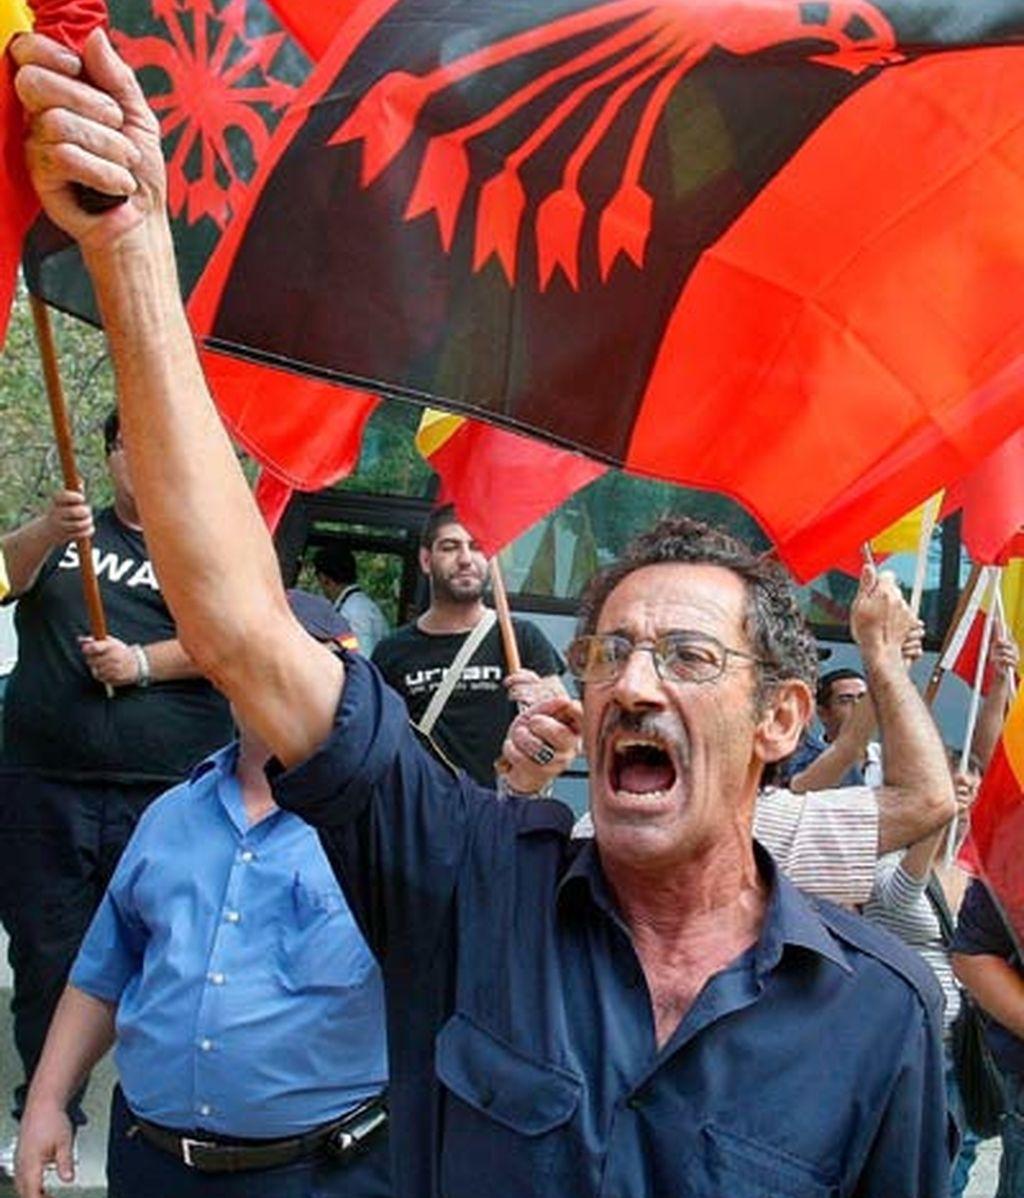 Grupo de falangistas en protesta